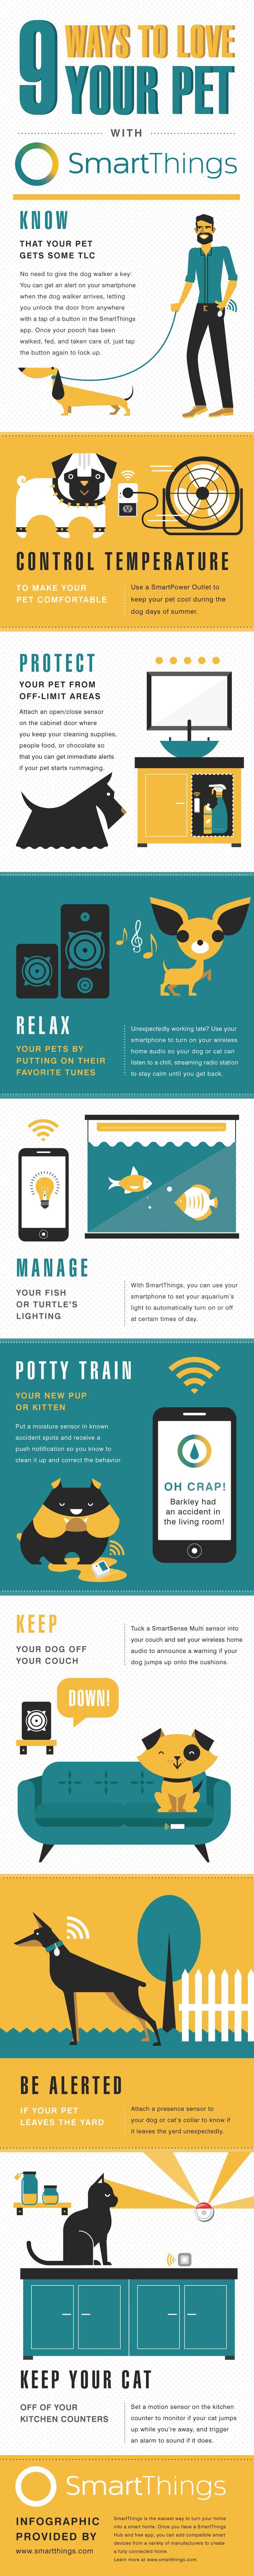 best Tips u Tricks images on Pinterest  Coolers Daylight